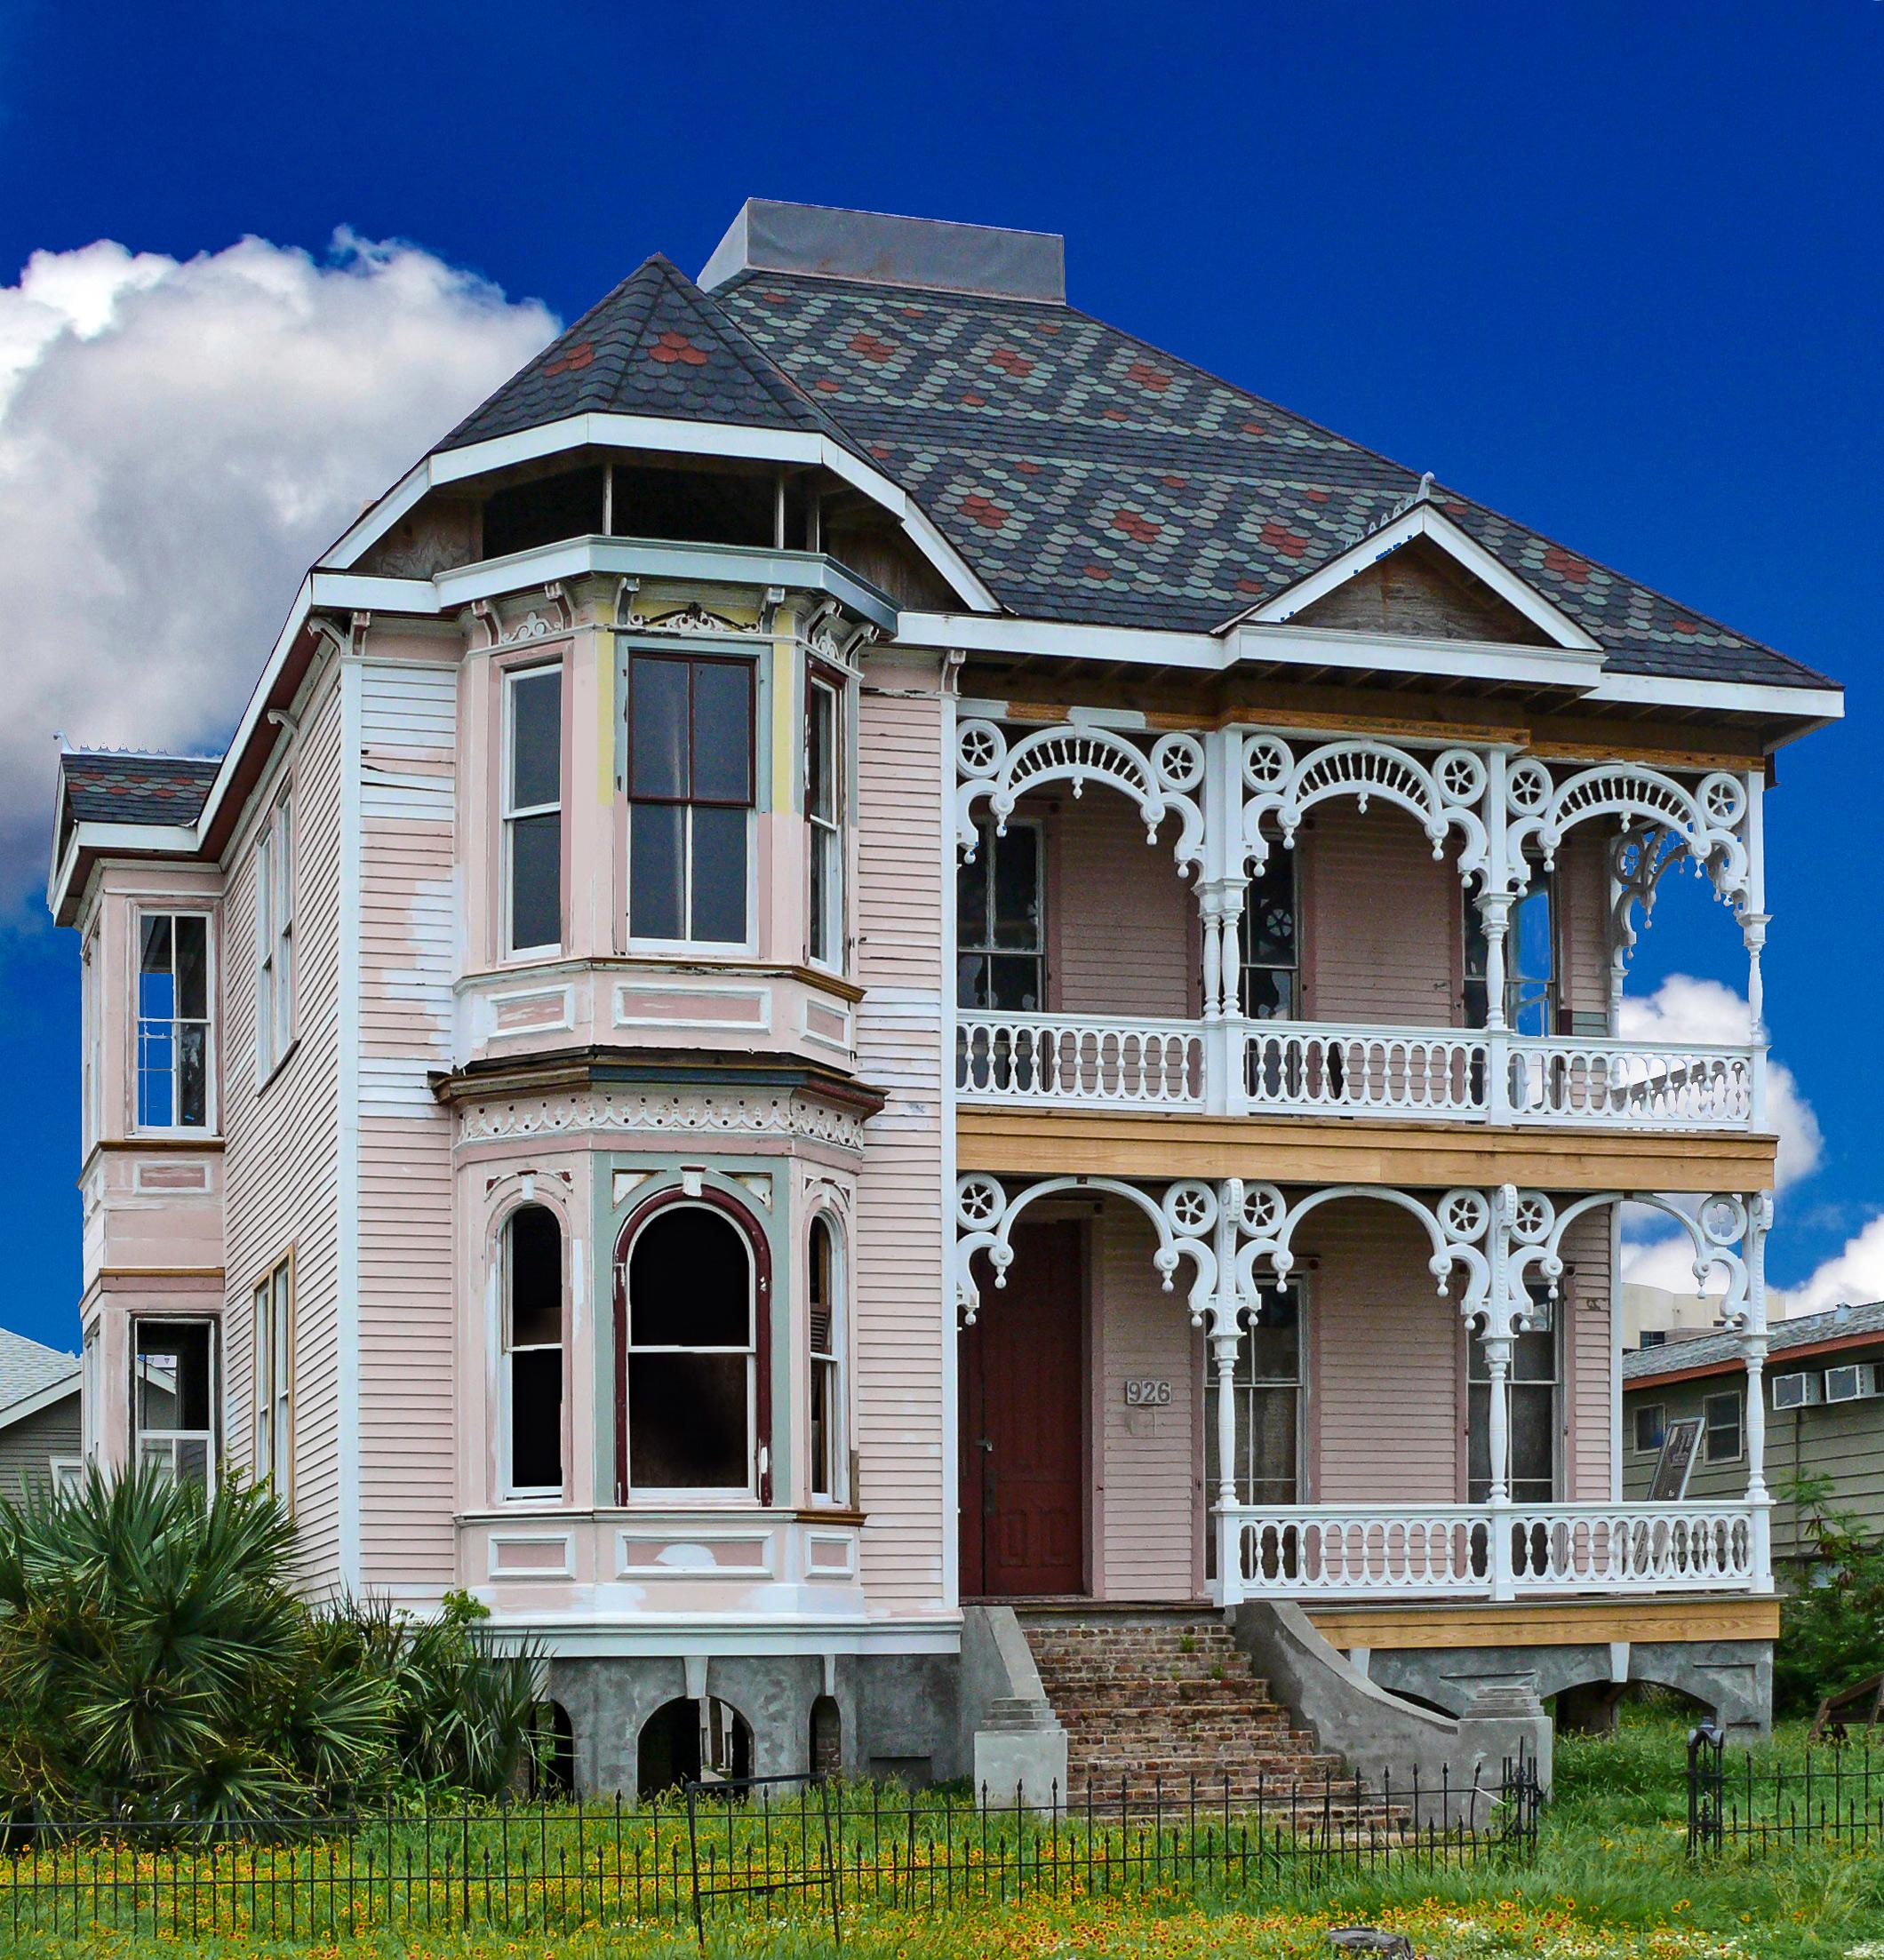 Home Pictures: File:McKinney-McDonald House, Galveston.jpg